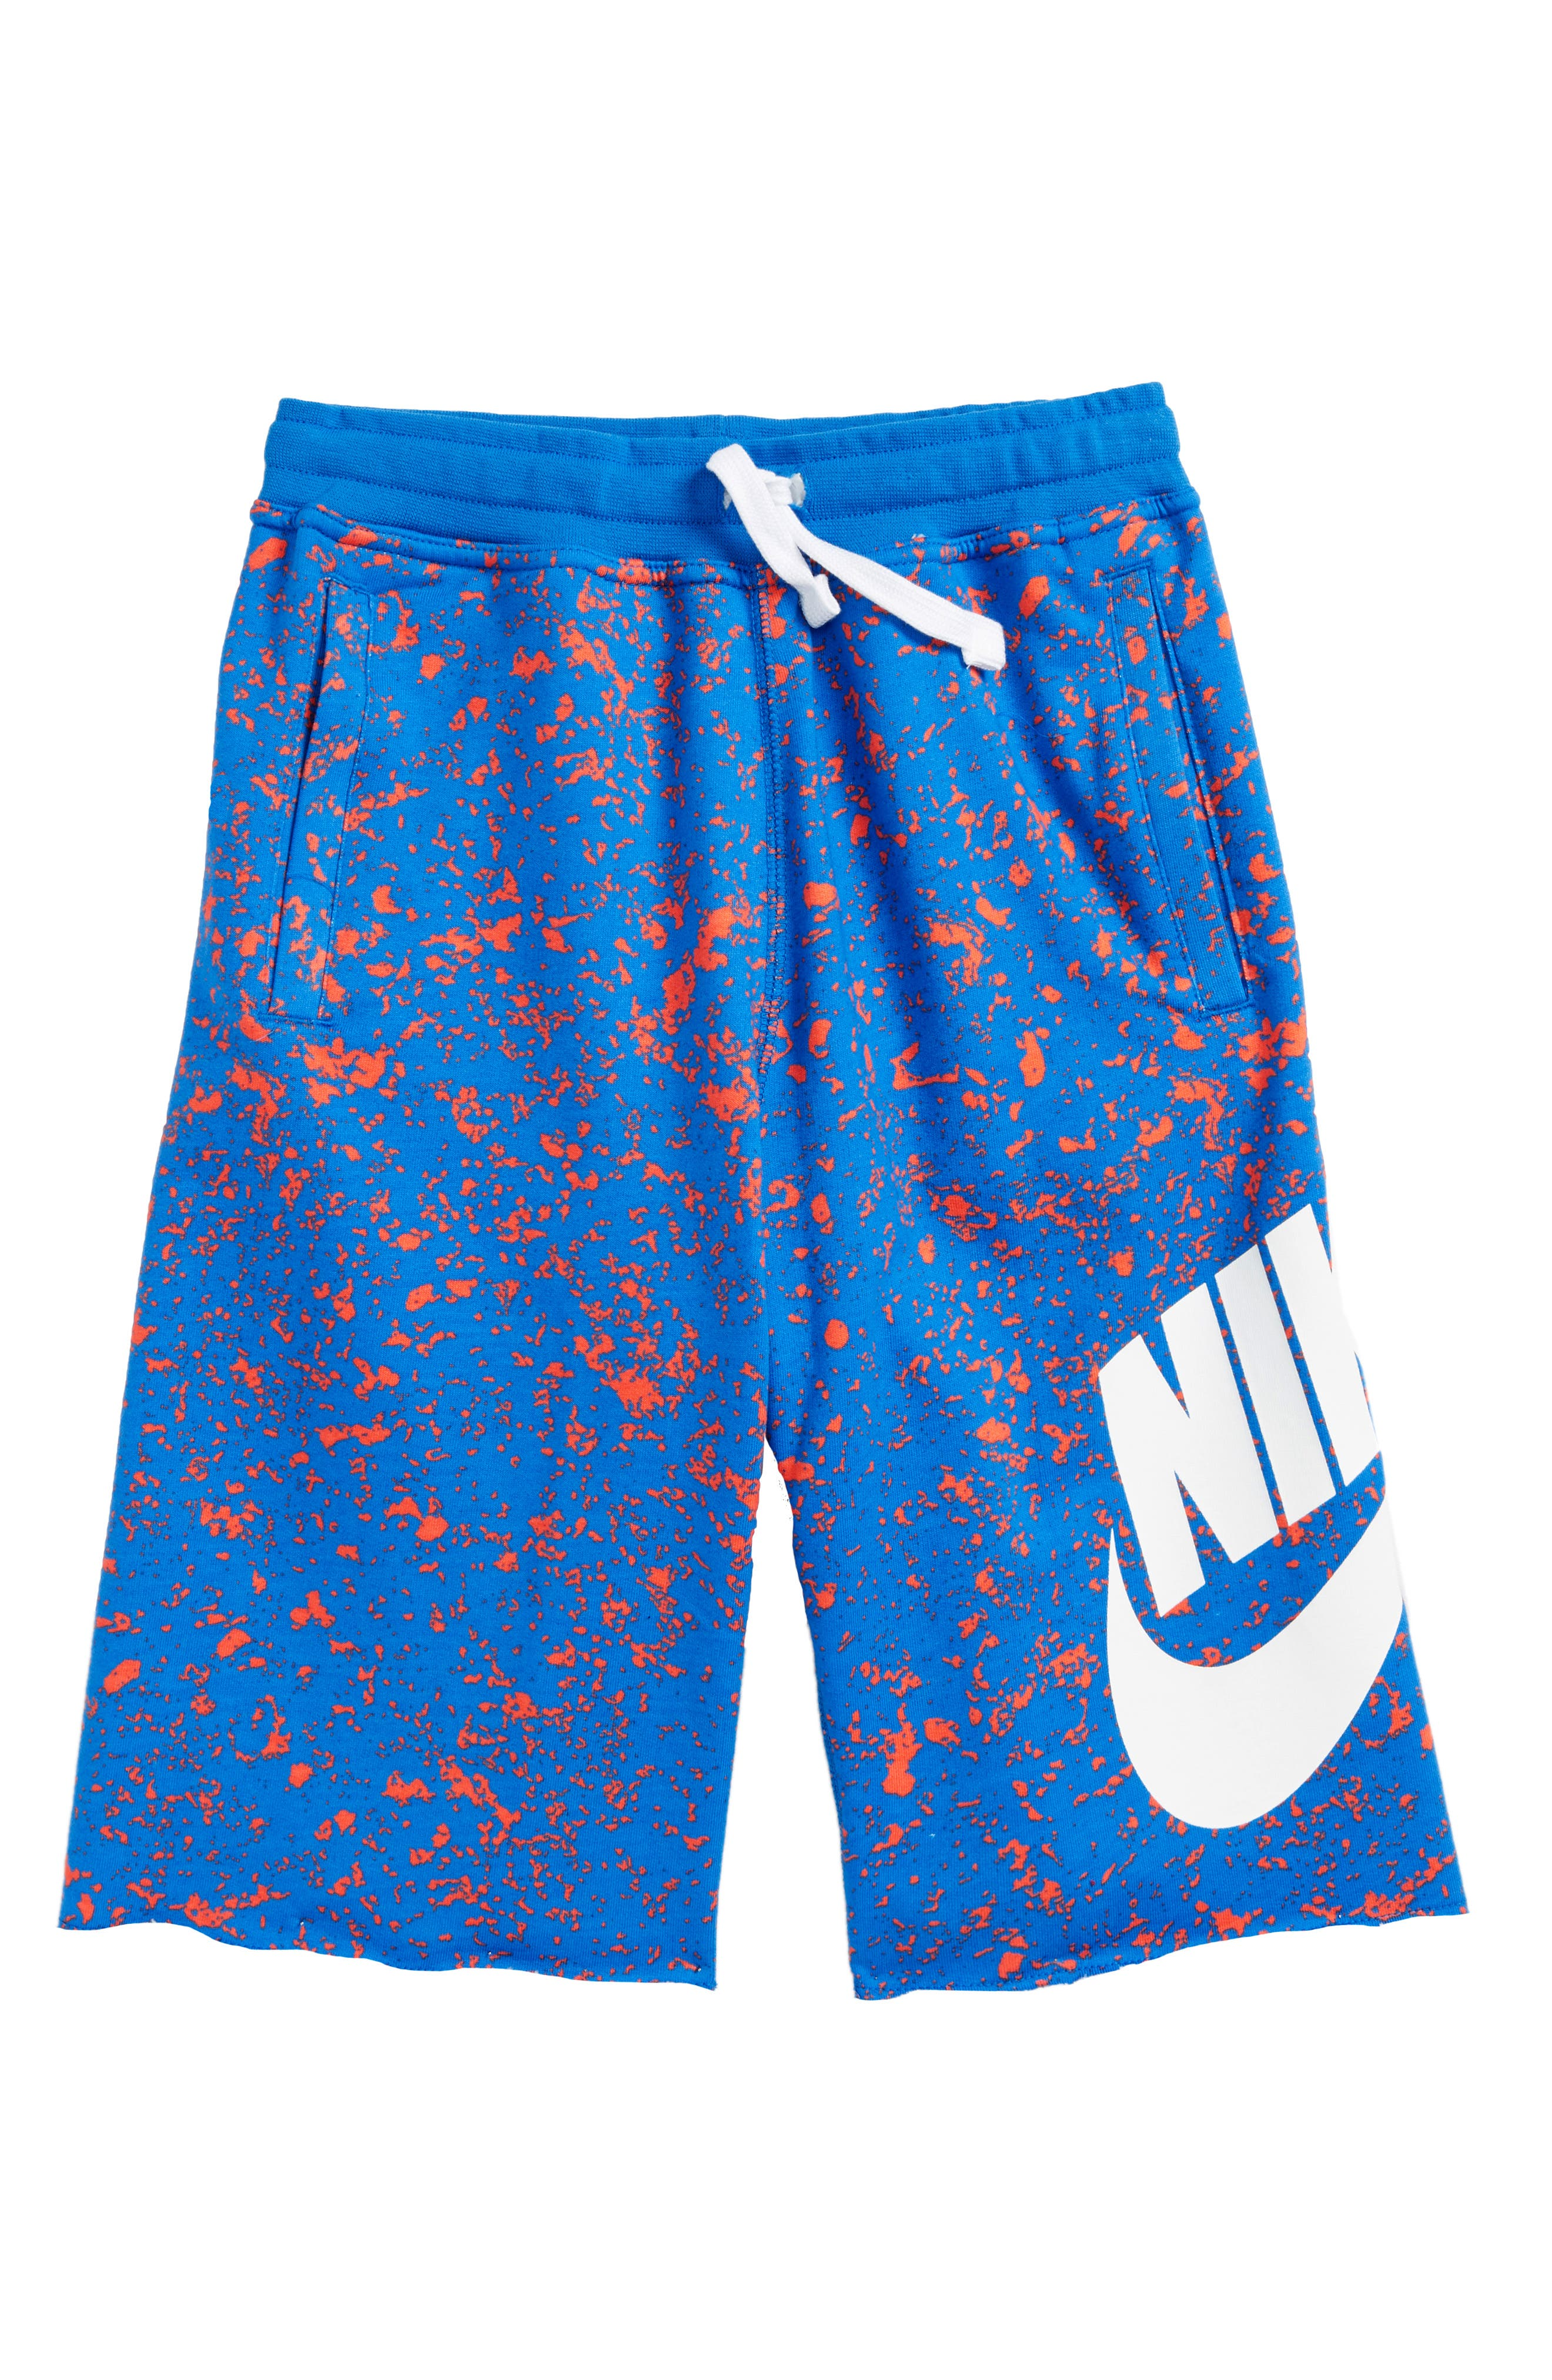 Sportswear Alumni Shorts,                             Main thumbnail 3, color,